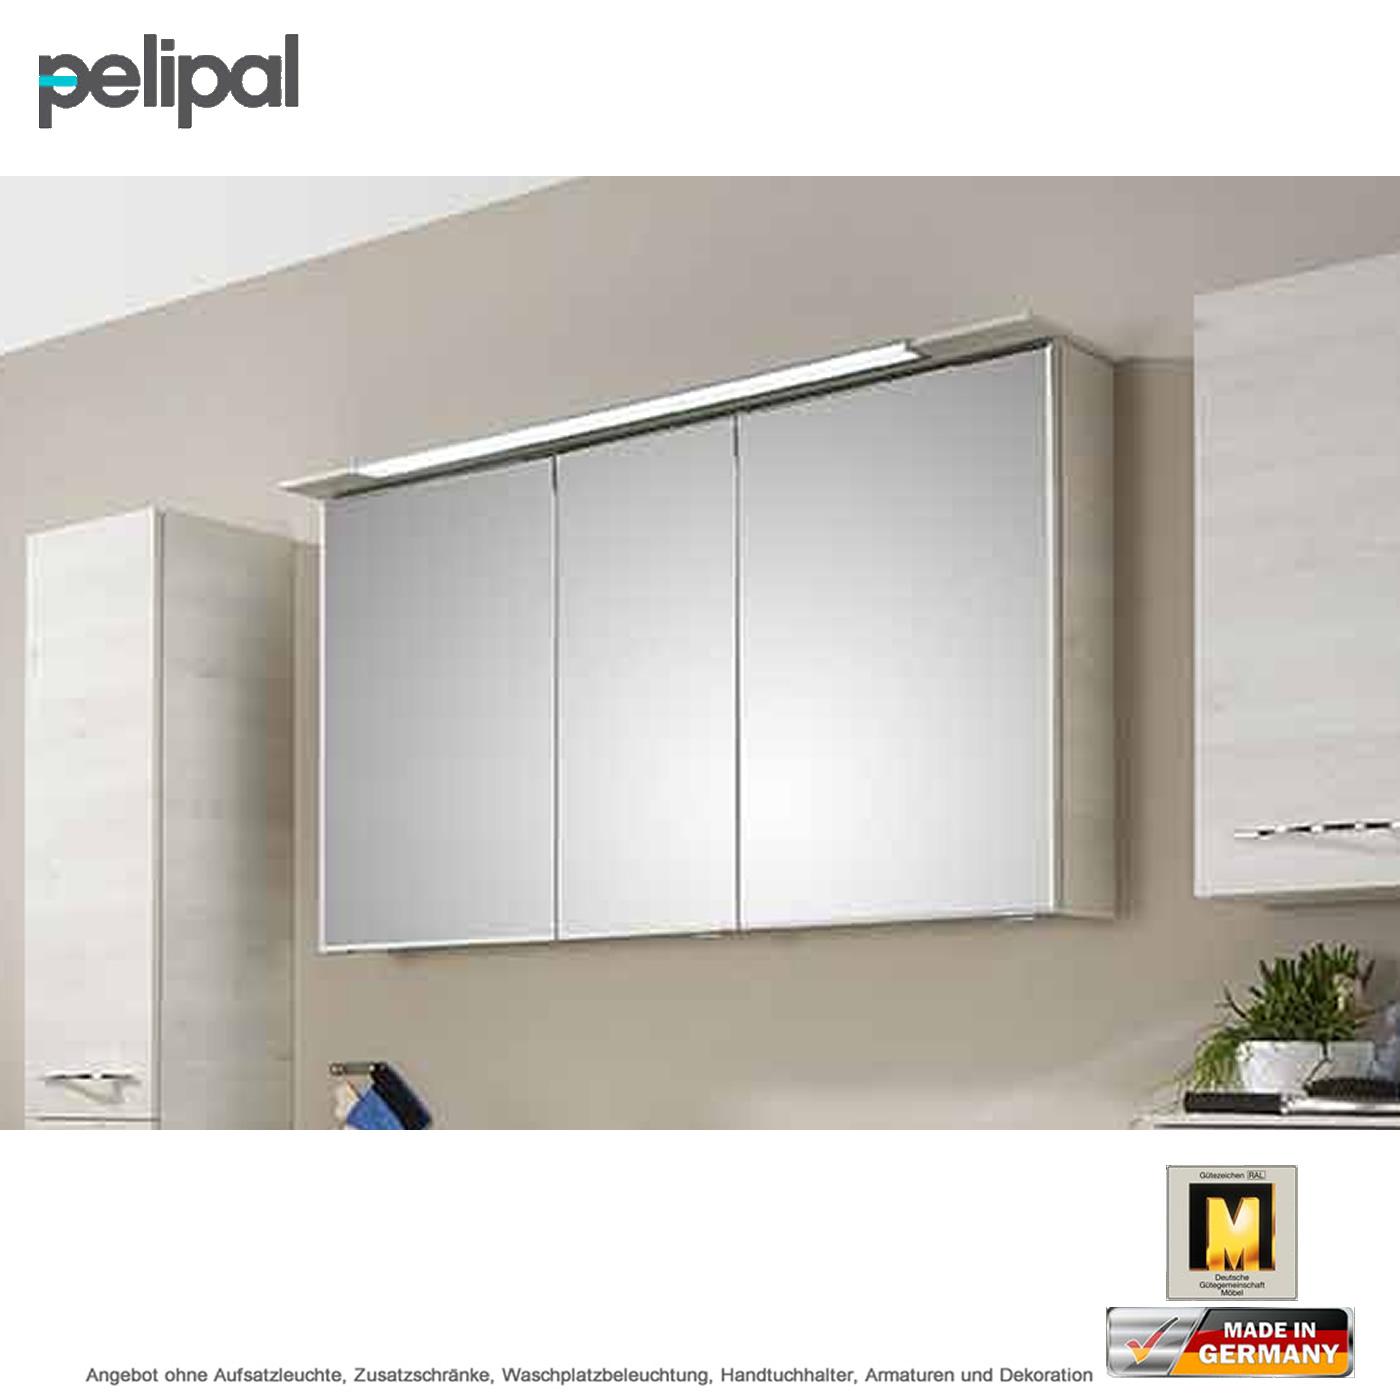 pelipal solitaire 6110 spiegelschrank 120 cm mit led kranzbeleuchtung impulsbad. Black Bedroom Furniture Sets. Home Design Ideas